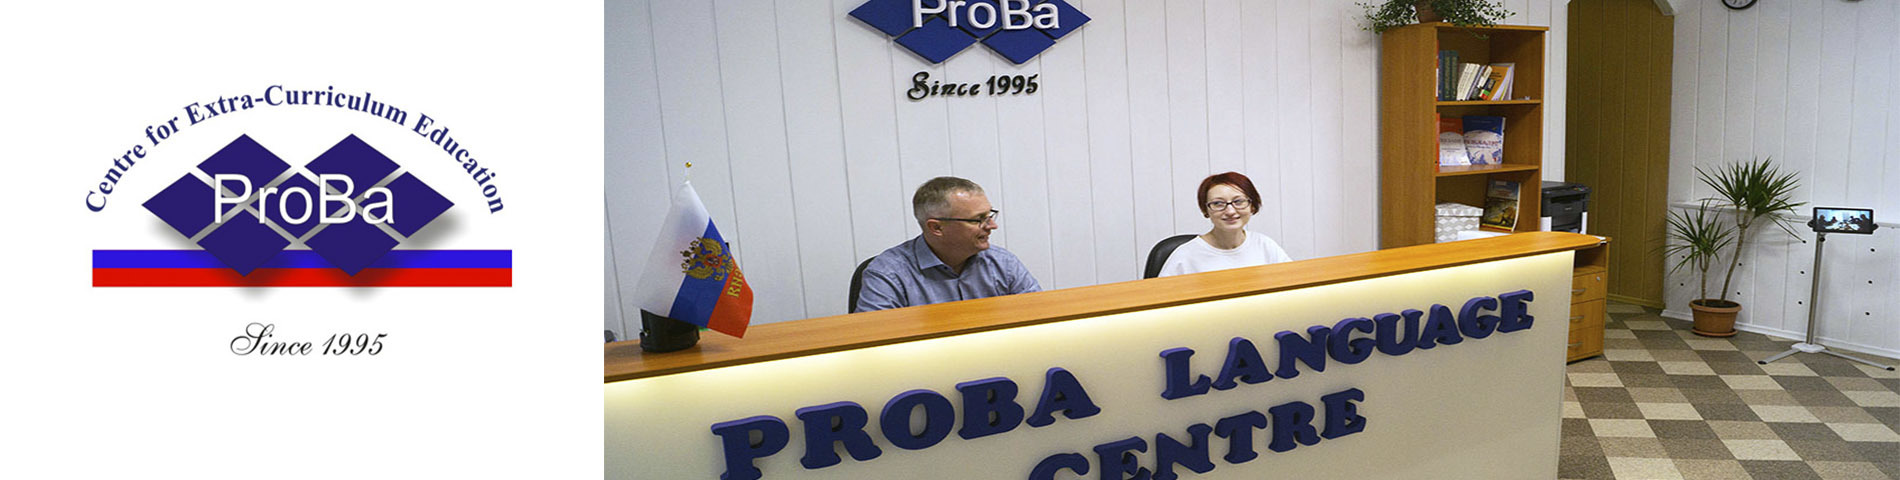 Obrázok školy ProBa Educational Centre – 1